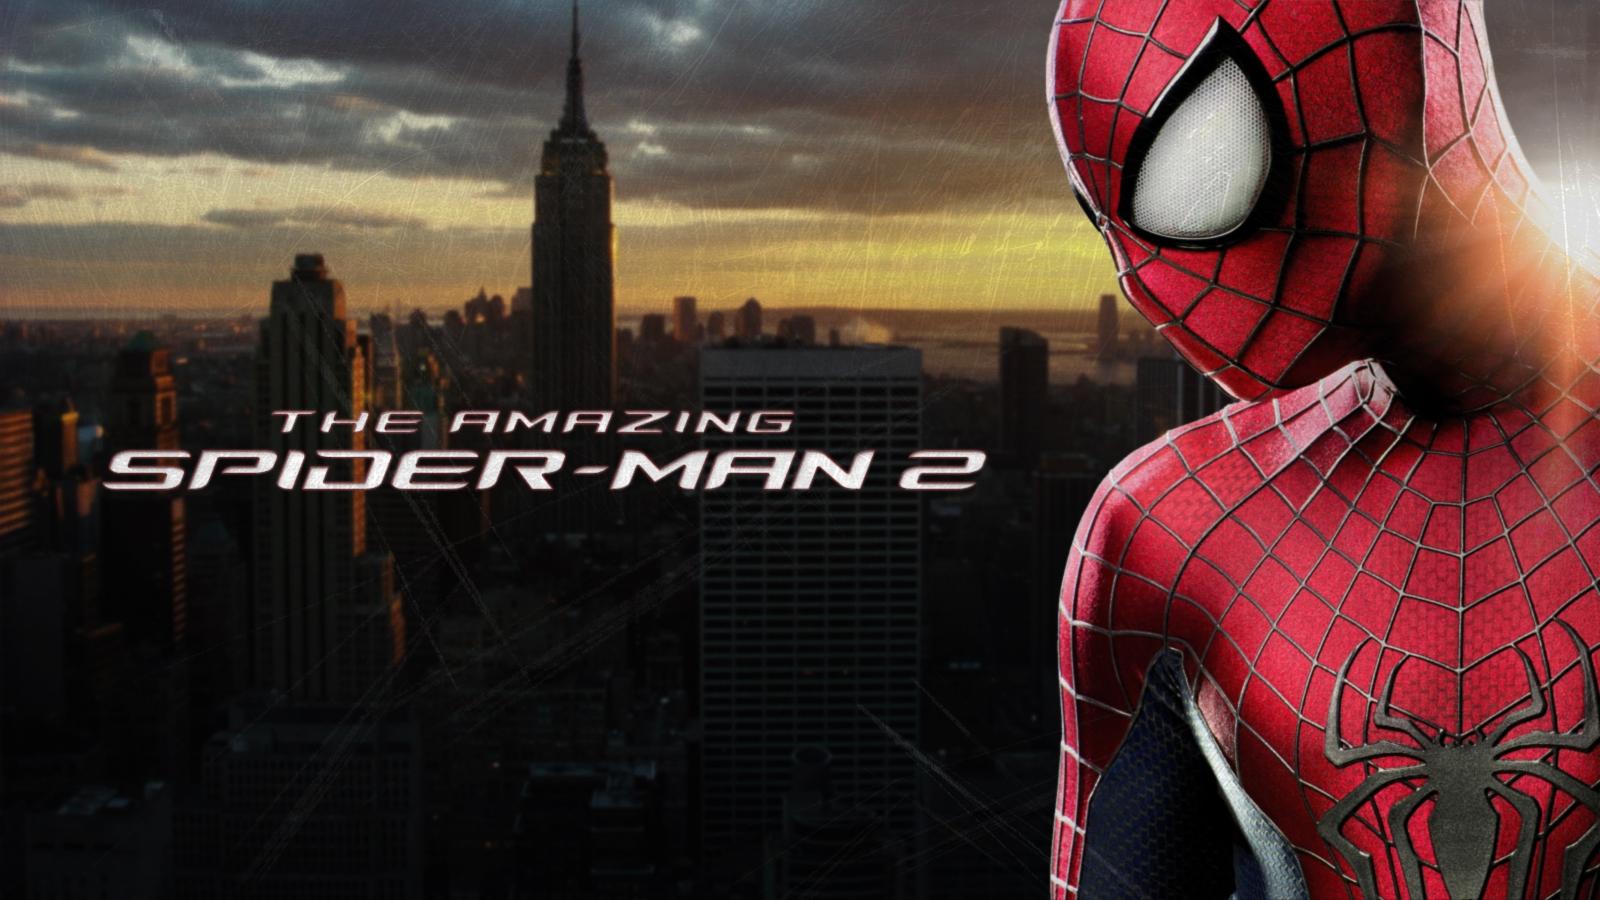 the amazing spider-man 2 wallpaper | krash